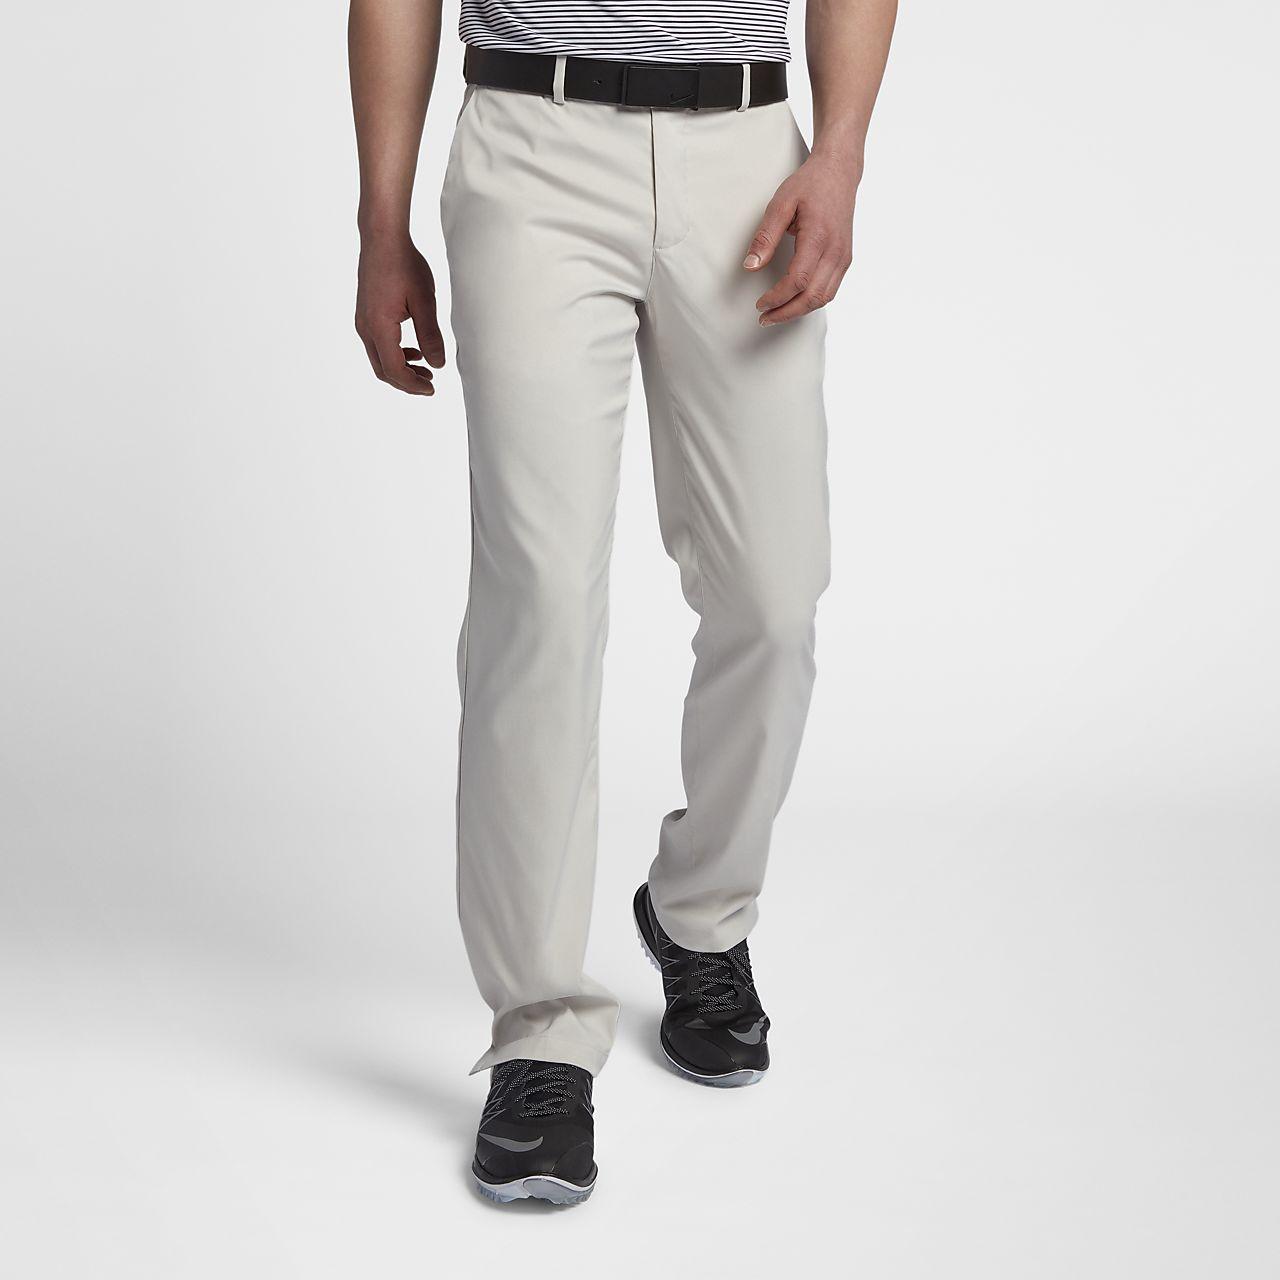 ... Nike Flat Front Men's Golf Pants